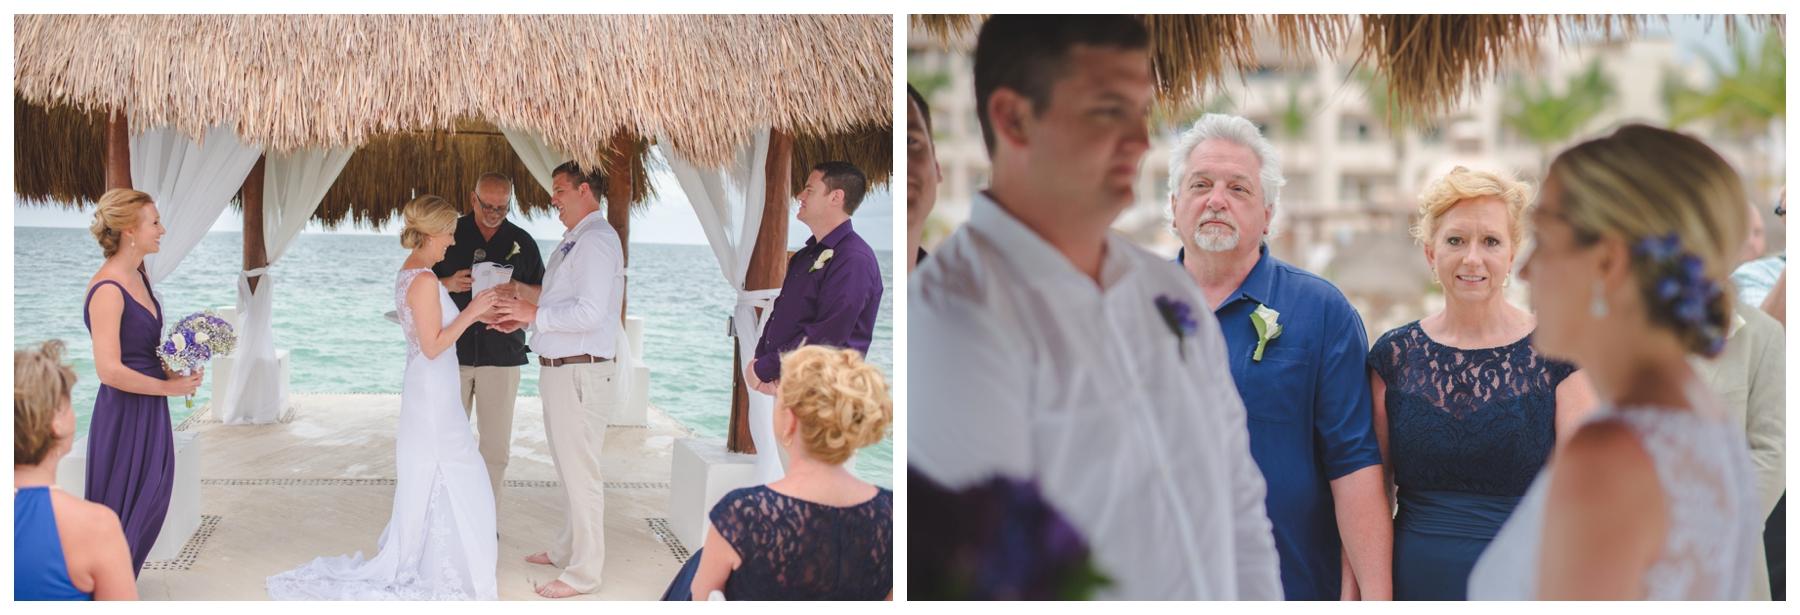 Cancun Riviera Maya Wedding_0005.jpg